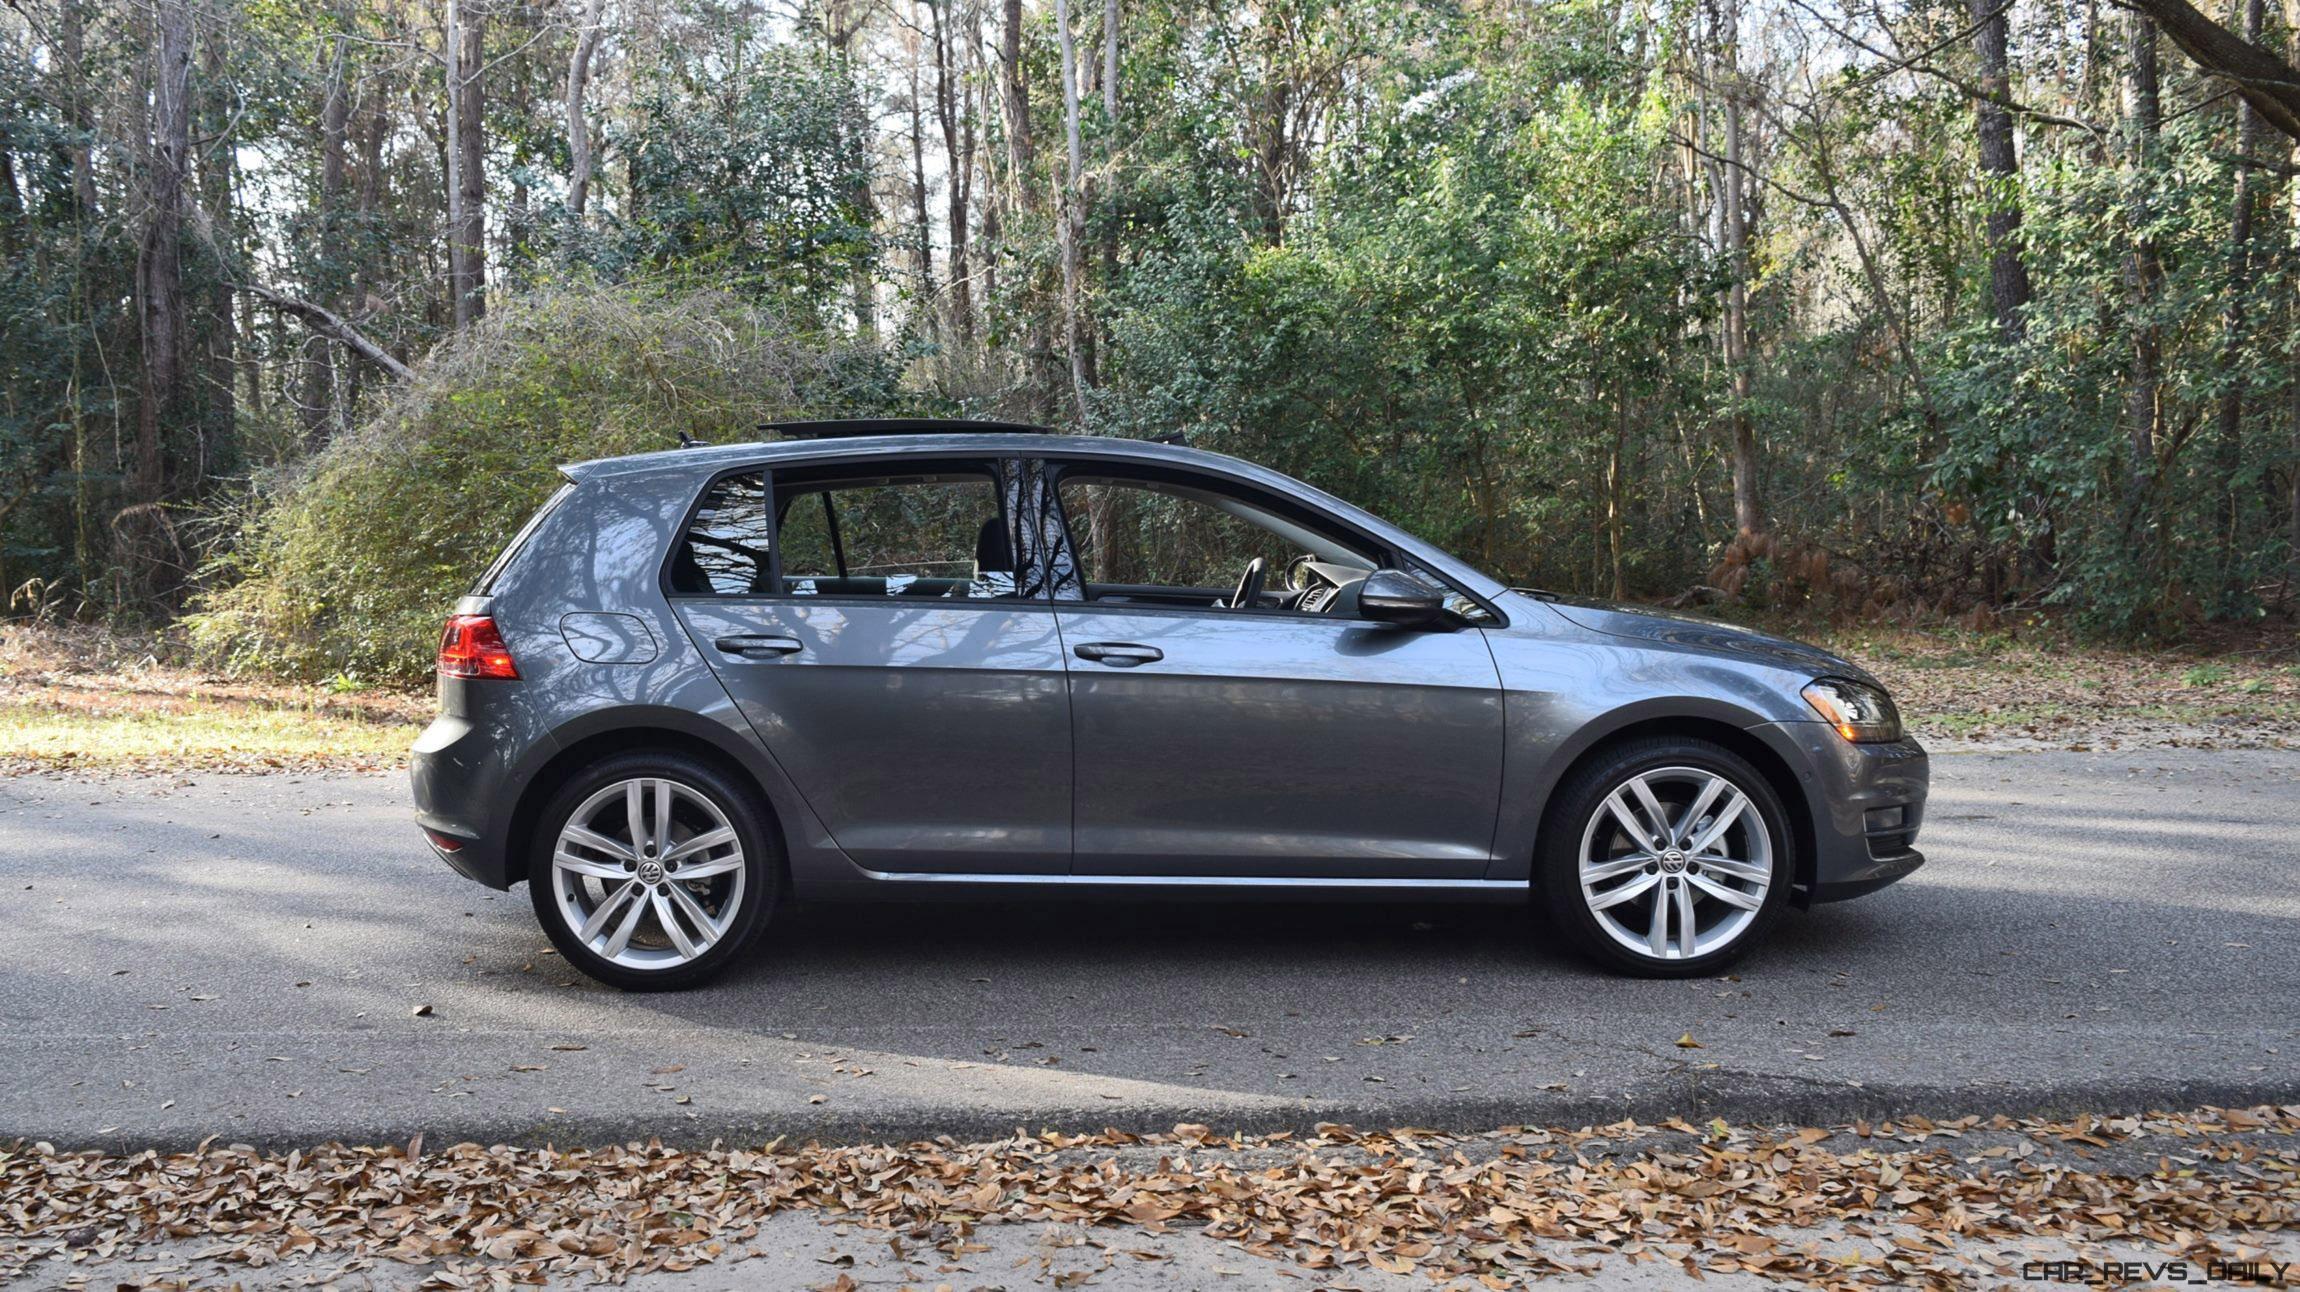 2017 Volkswagen Golf Alltrack Tsi Sel >> 2017 VW Golf TSI SEL (Wolfsburg Edition) - Road Test Review w/ Video » Car-Revs-Daily.com